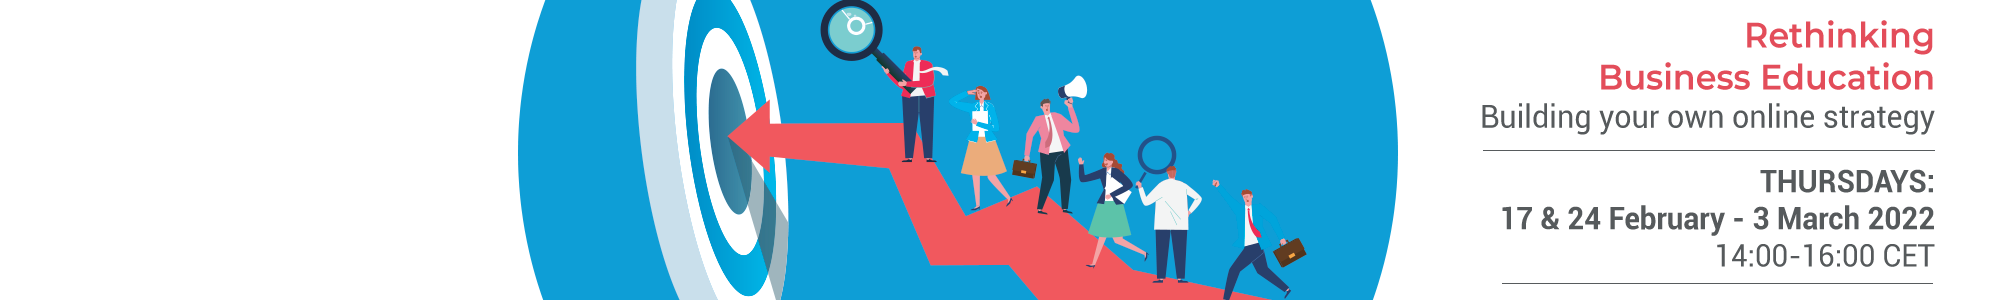 2022-EFMD-Rethinking-Business-Education-Feb-website-simple